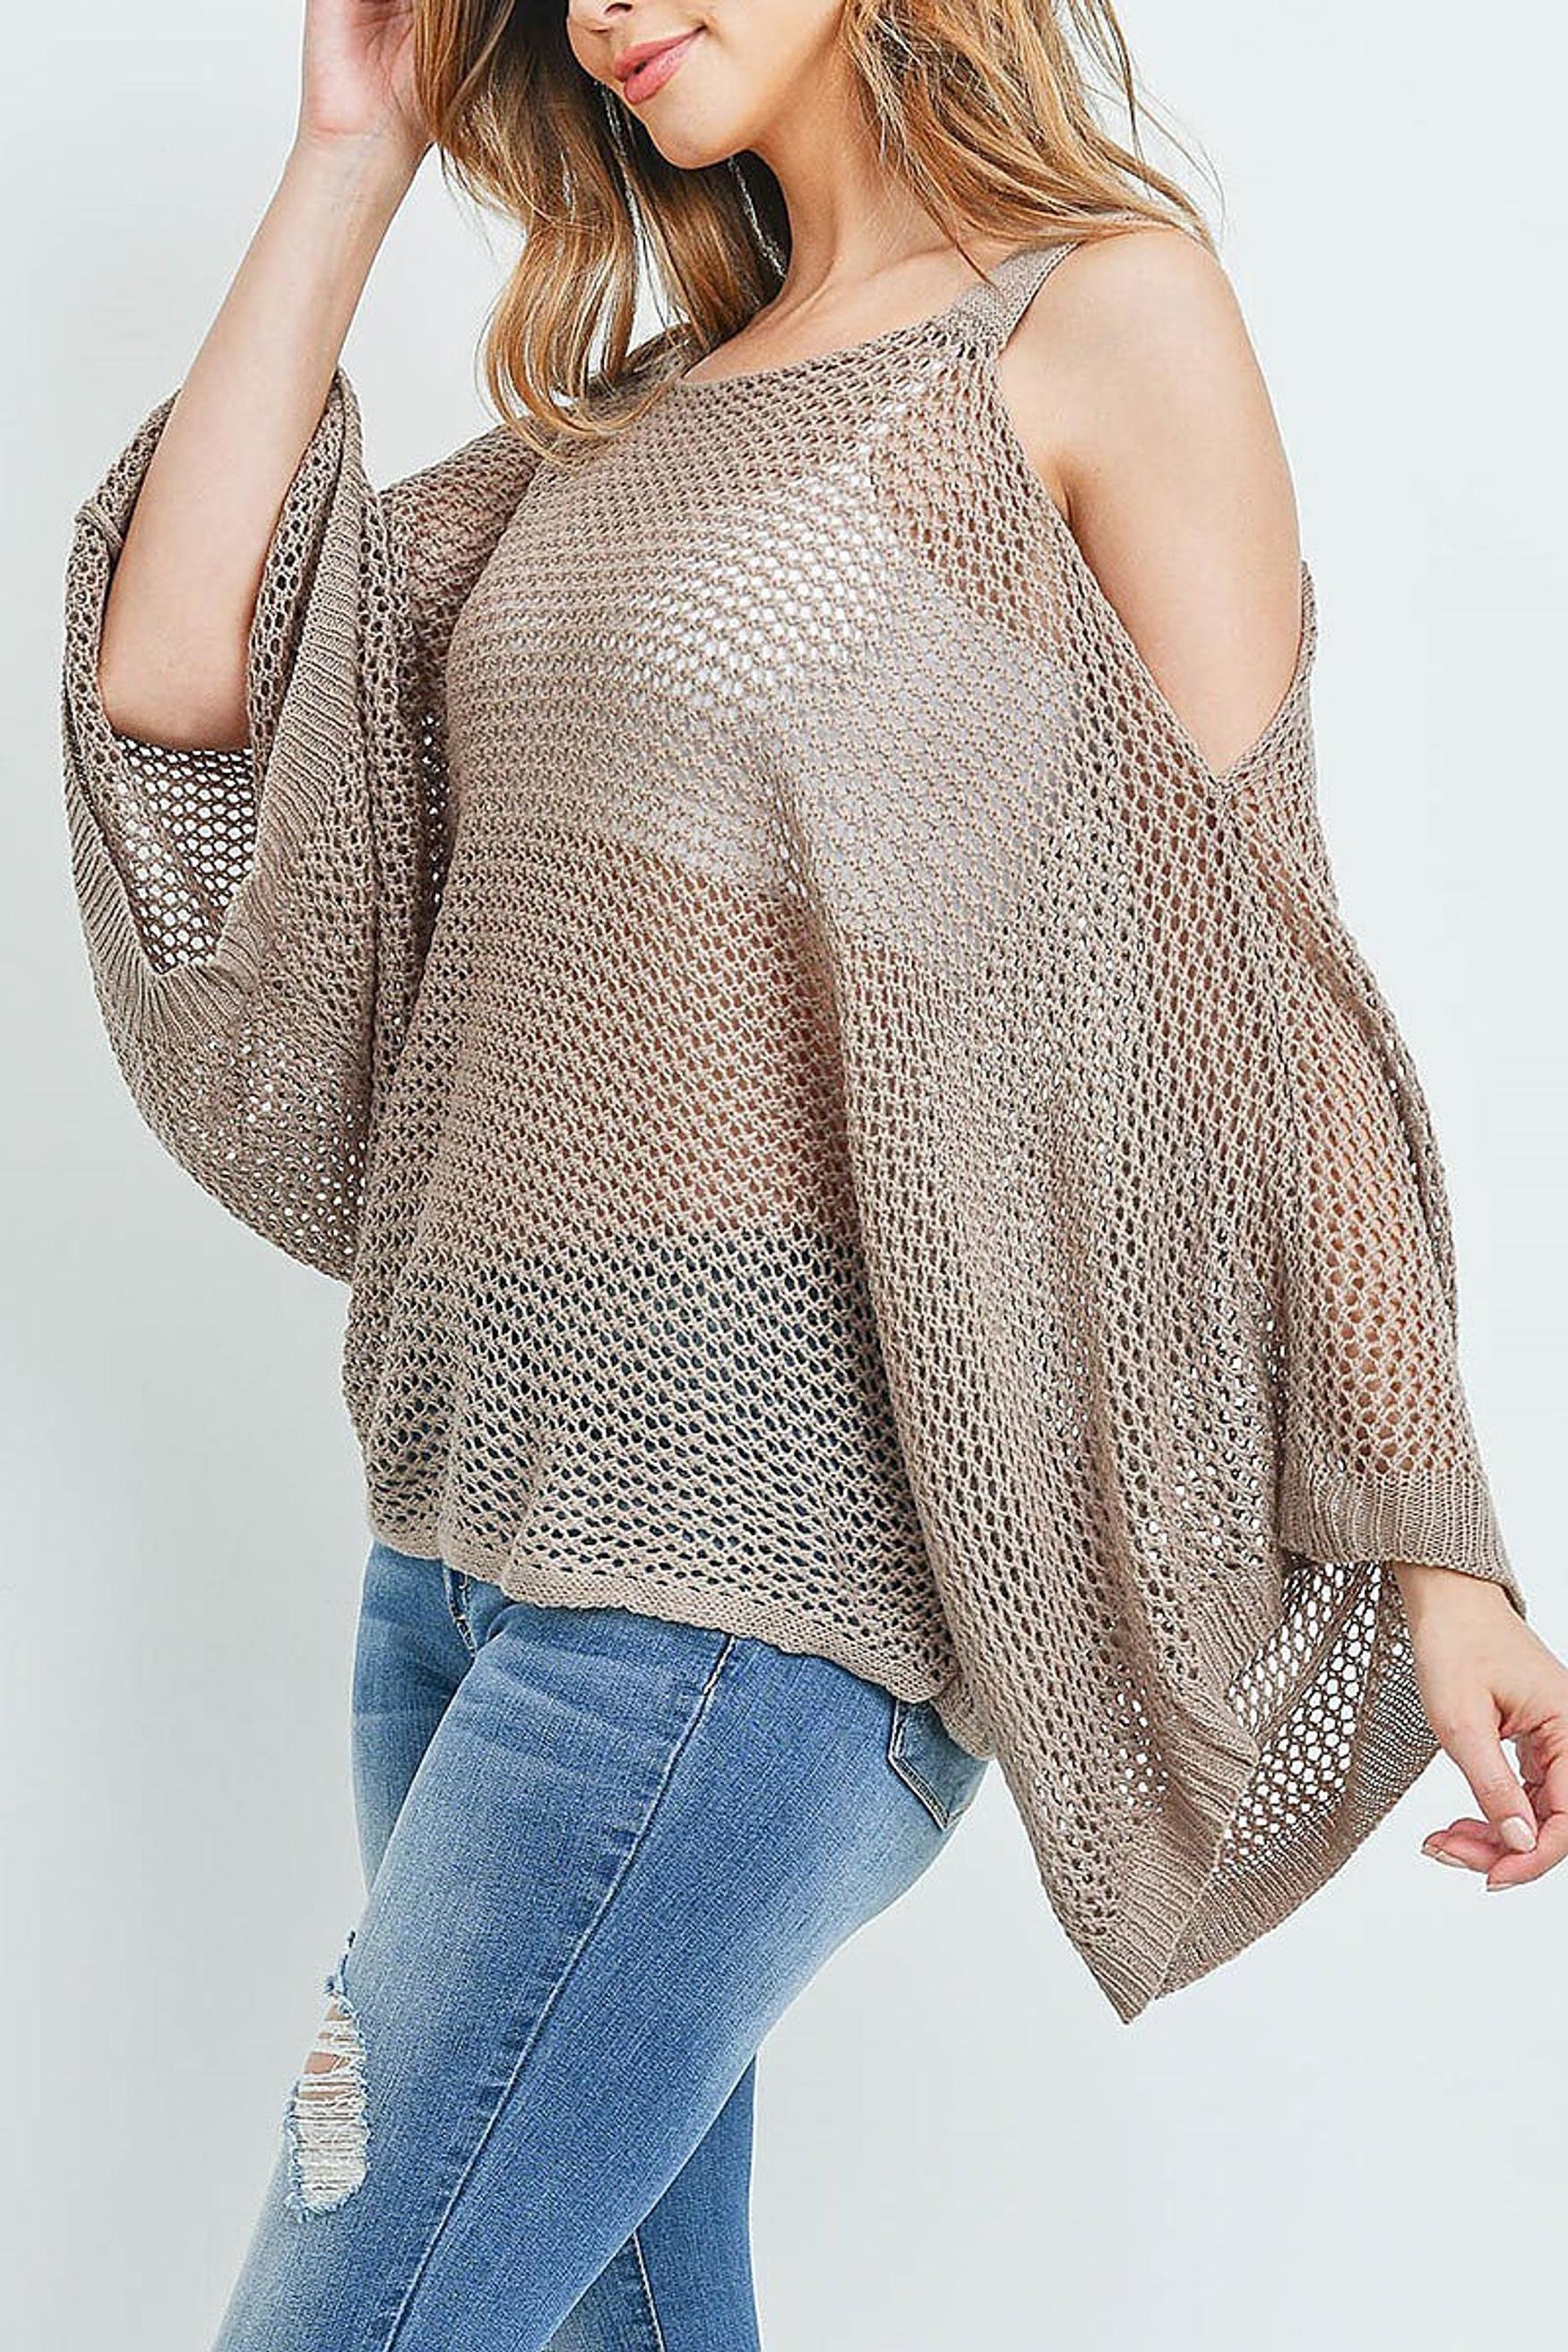 Mocha Crochet Wide Sleeve Cold Shoulder Top